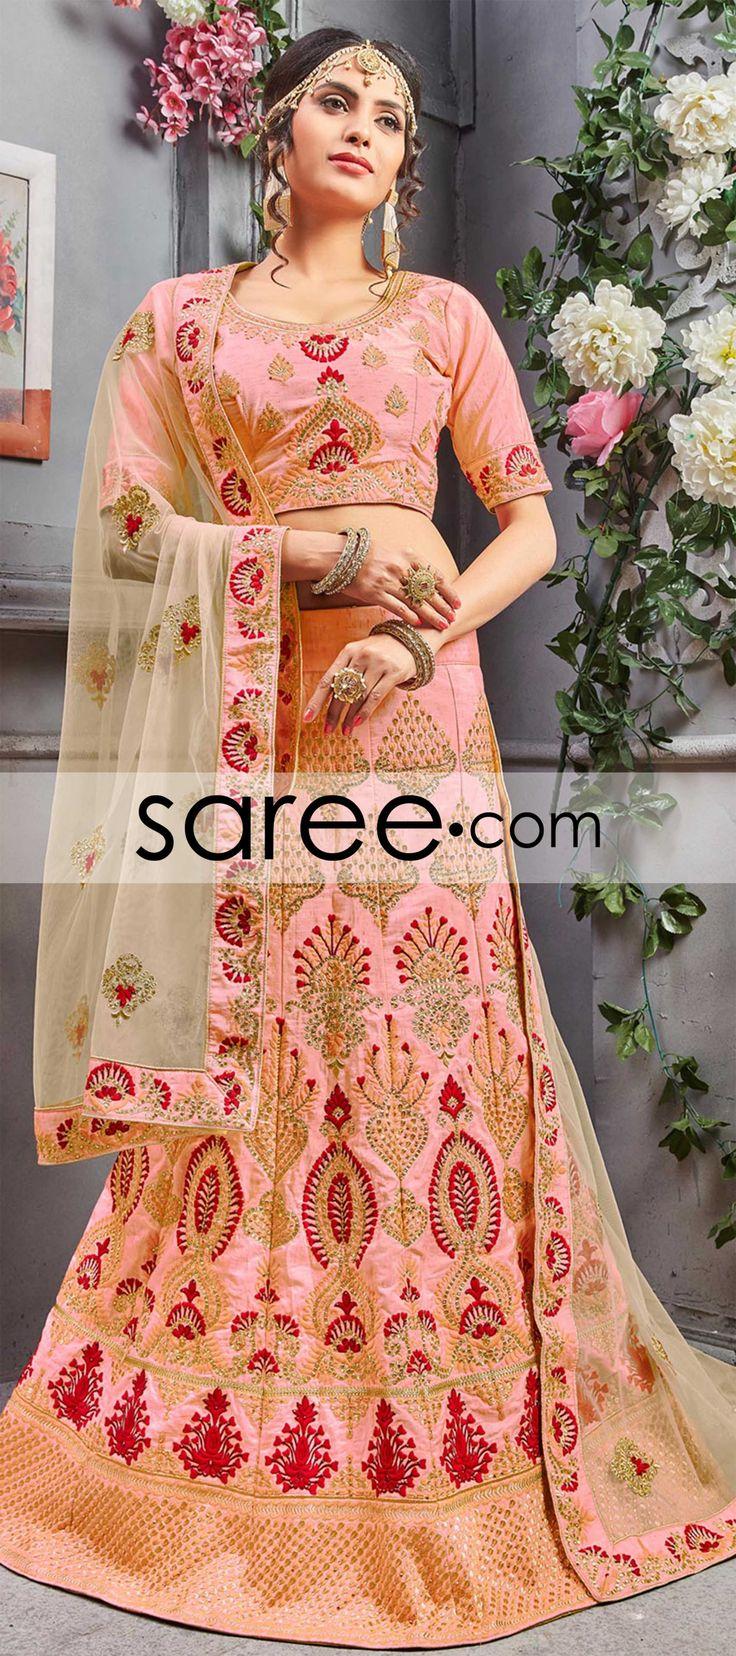 best dilip patel images on pinterest bridal dresses red